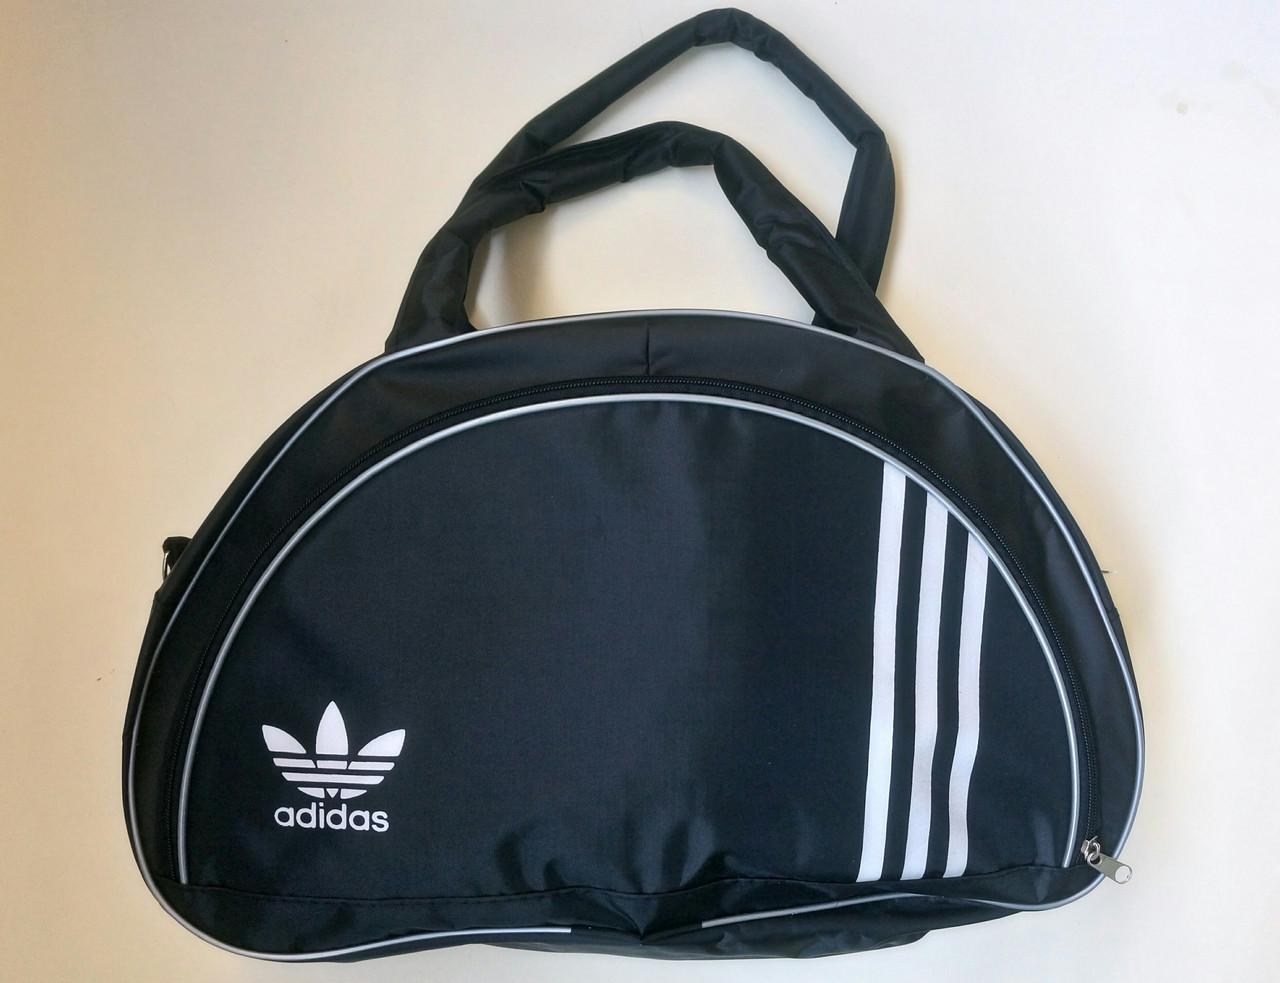 29dca8ea Сумка мужская спортивная, сумка женская спортивная, сумка для фитнеса, сумка  на тренировку,